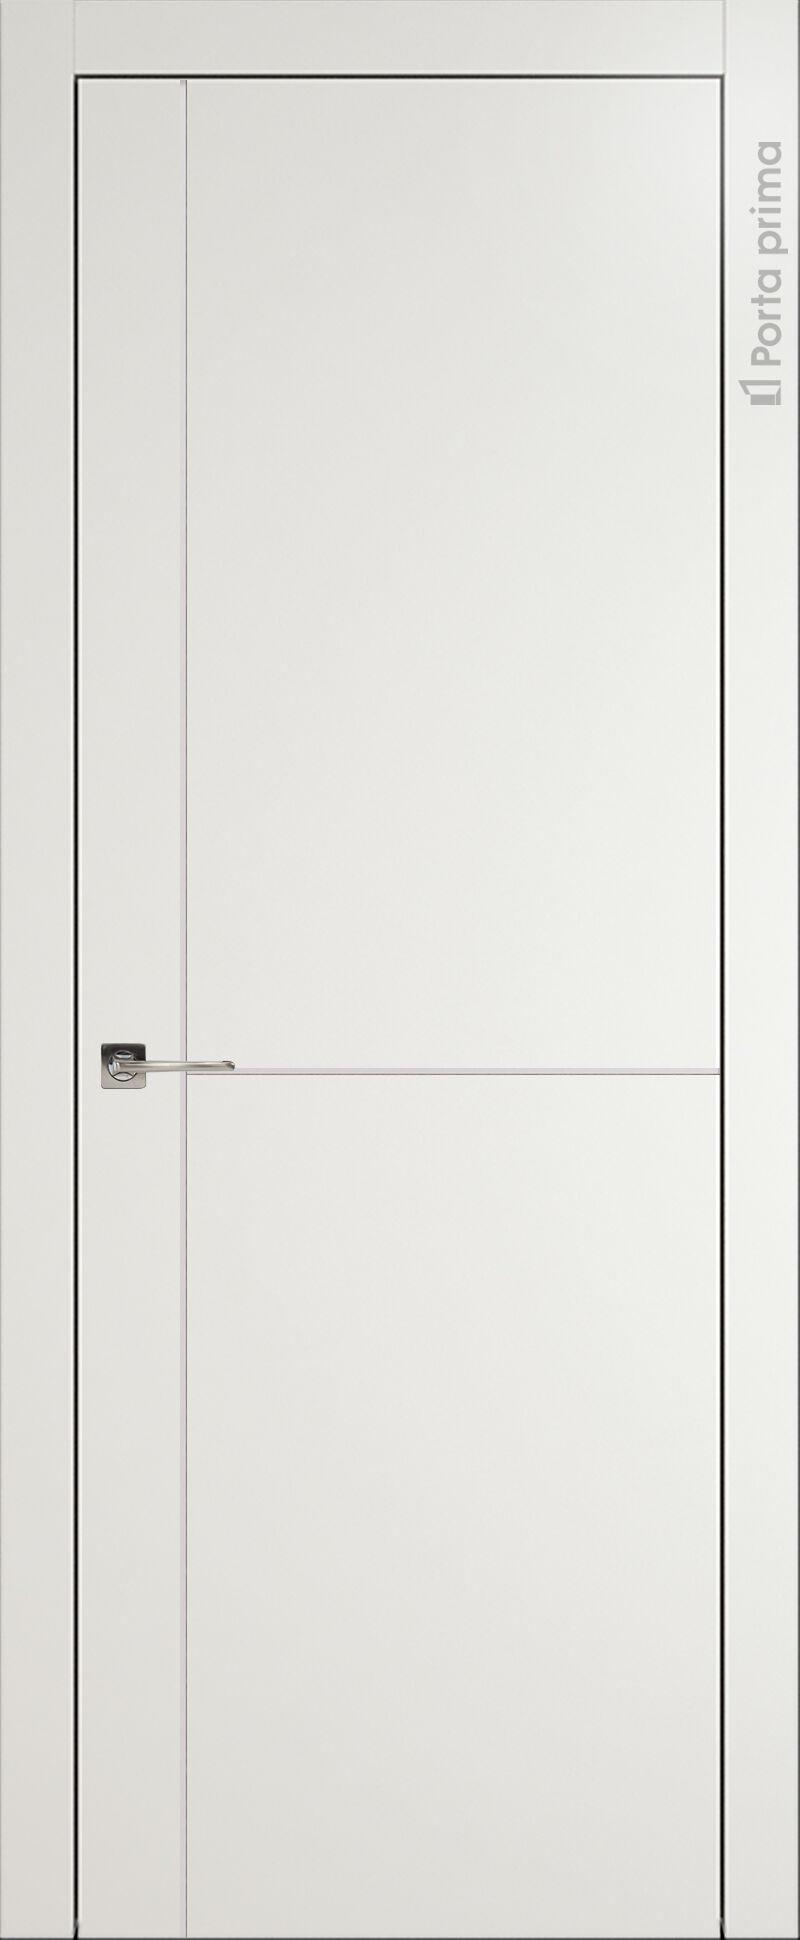 Tivoli Е-3 цвет - Бежевая эмаль (RAL 9010) Без стекла (ДГ)